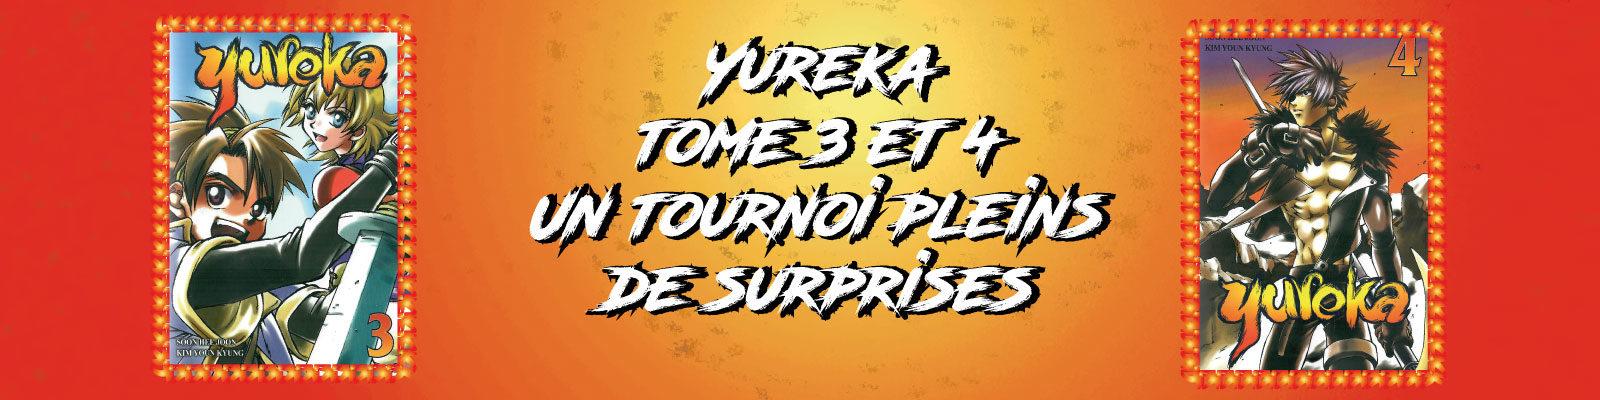 Yureka T3